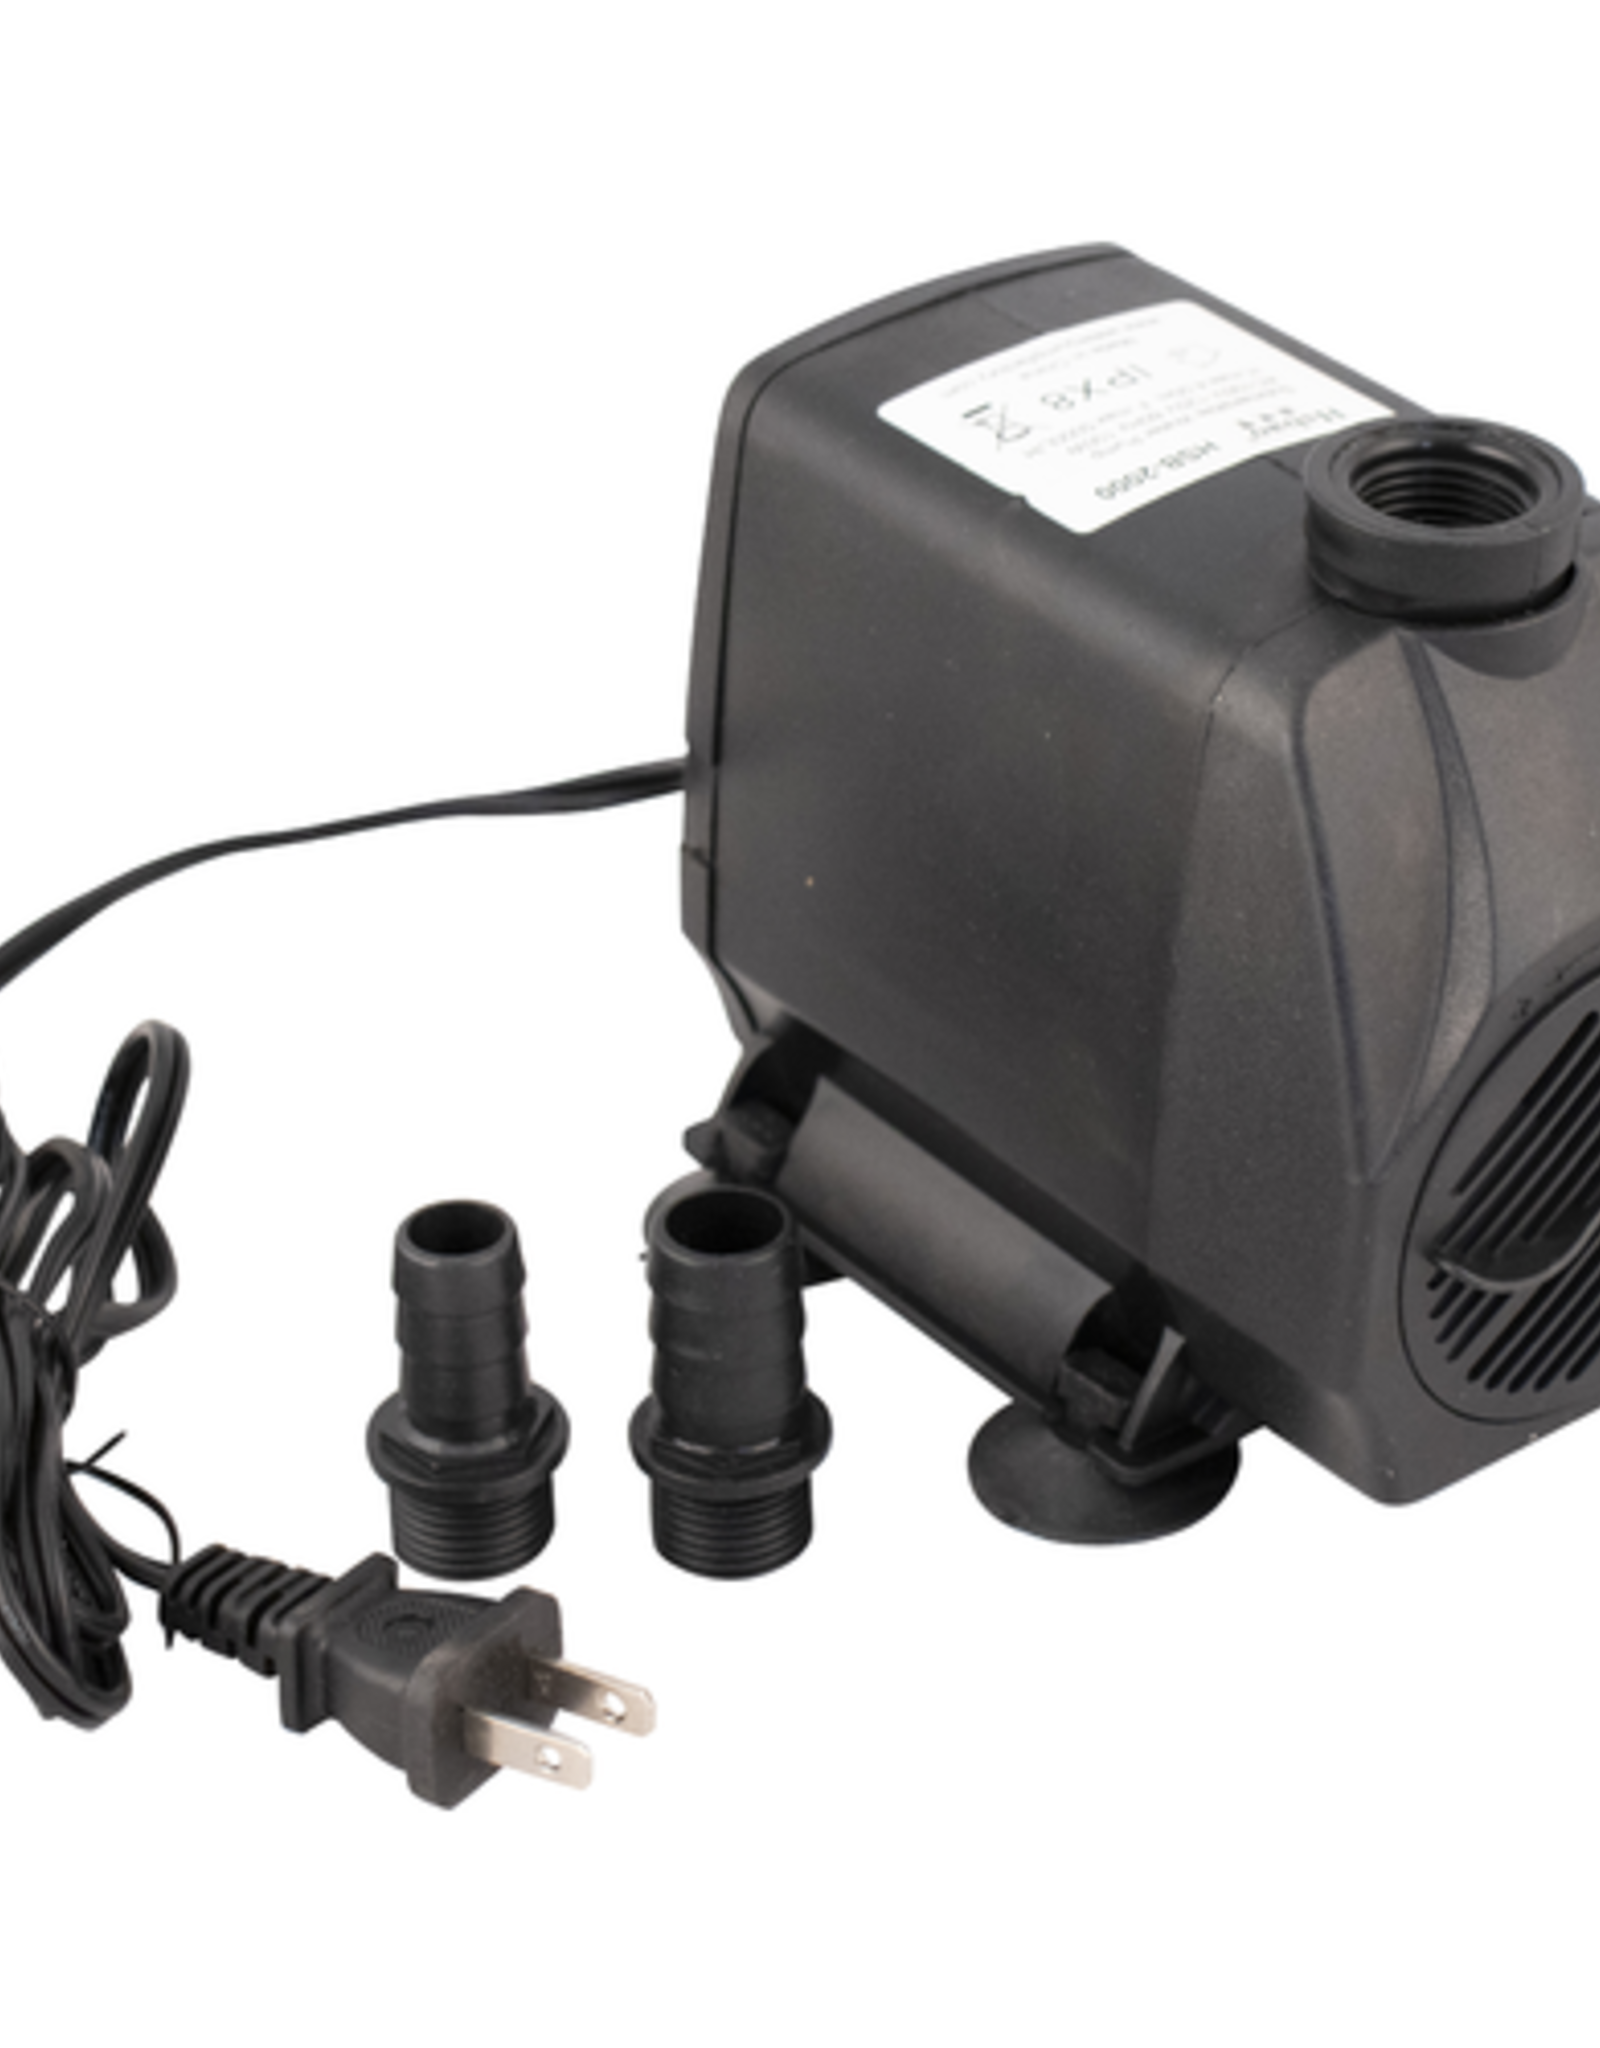 Submersible Pump - 10 gal. to 2 bbl (1300 gph)